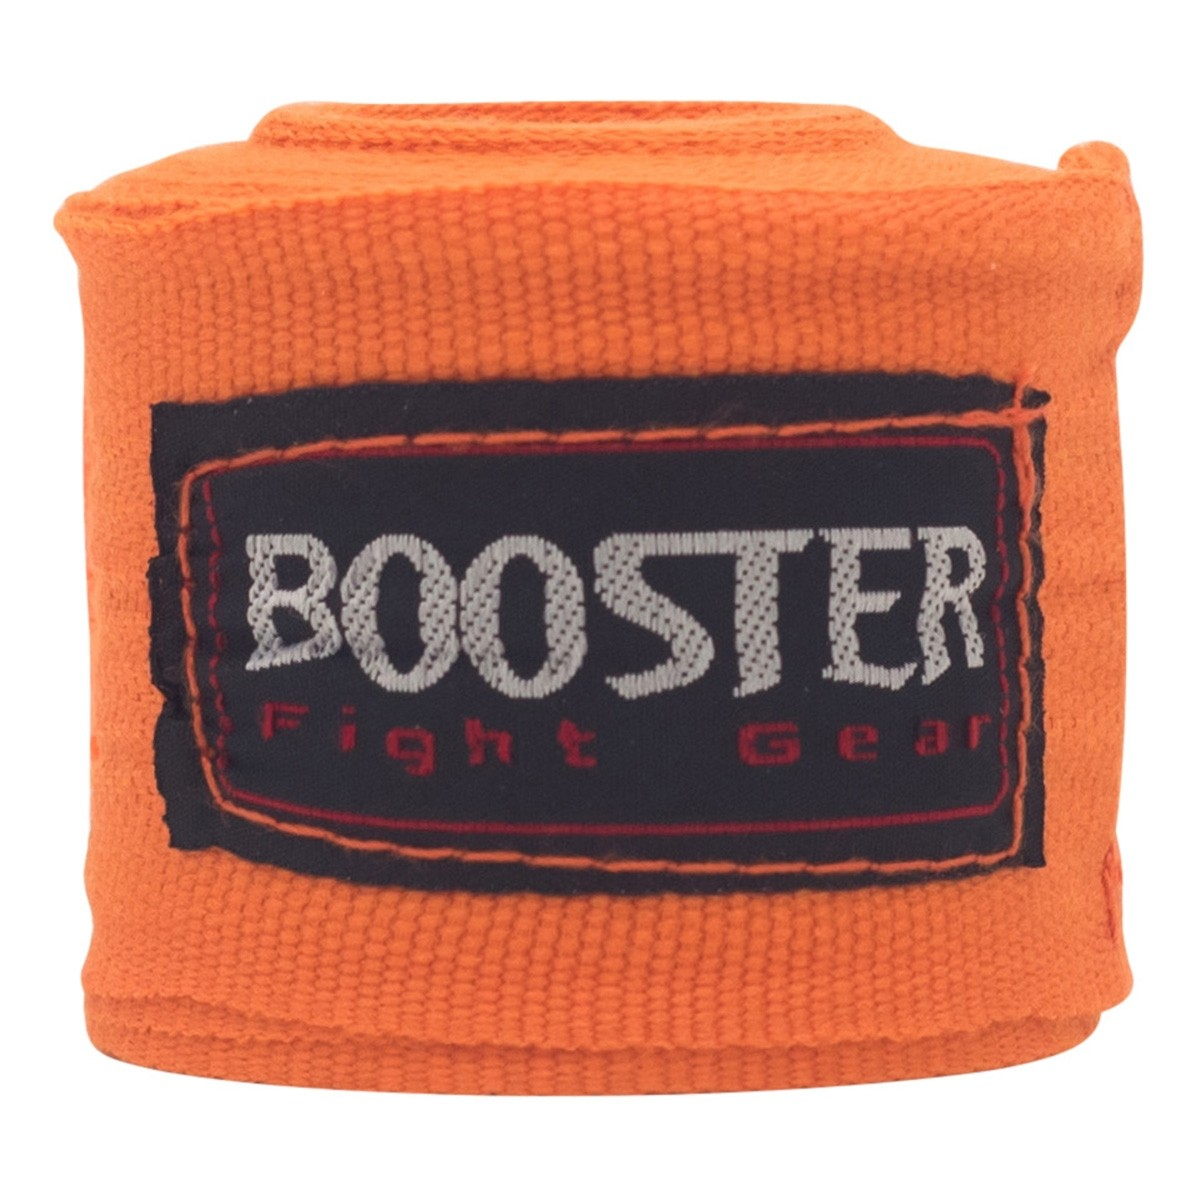 Booster bandage fluo oranje 460cm – jokasport.nl